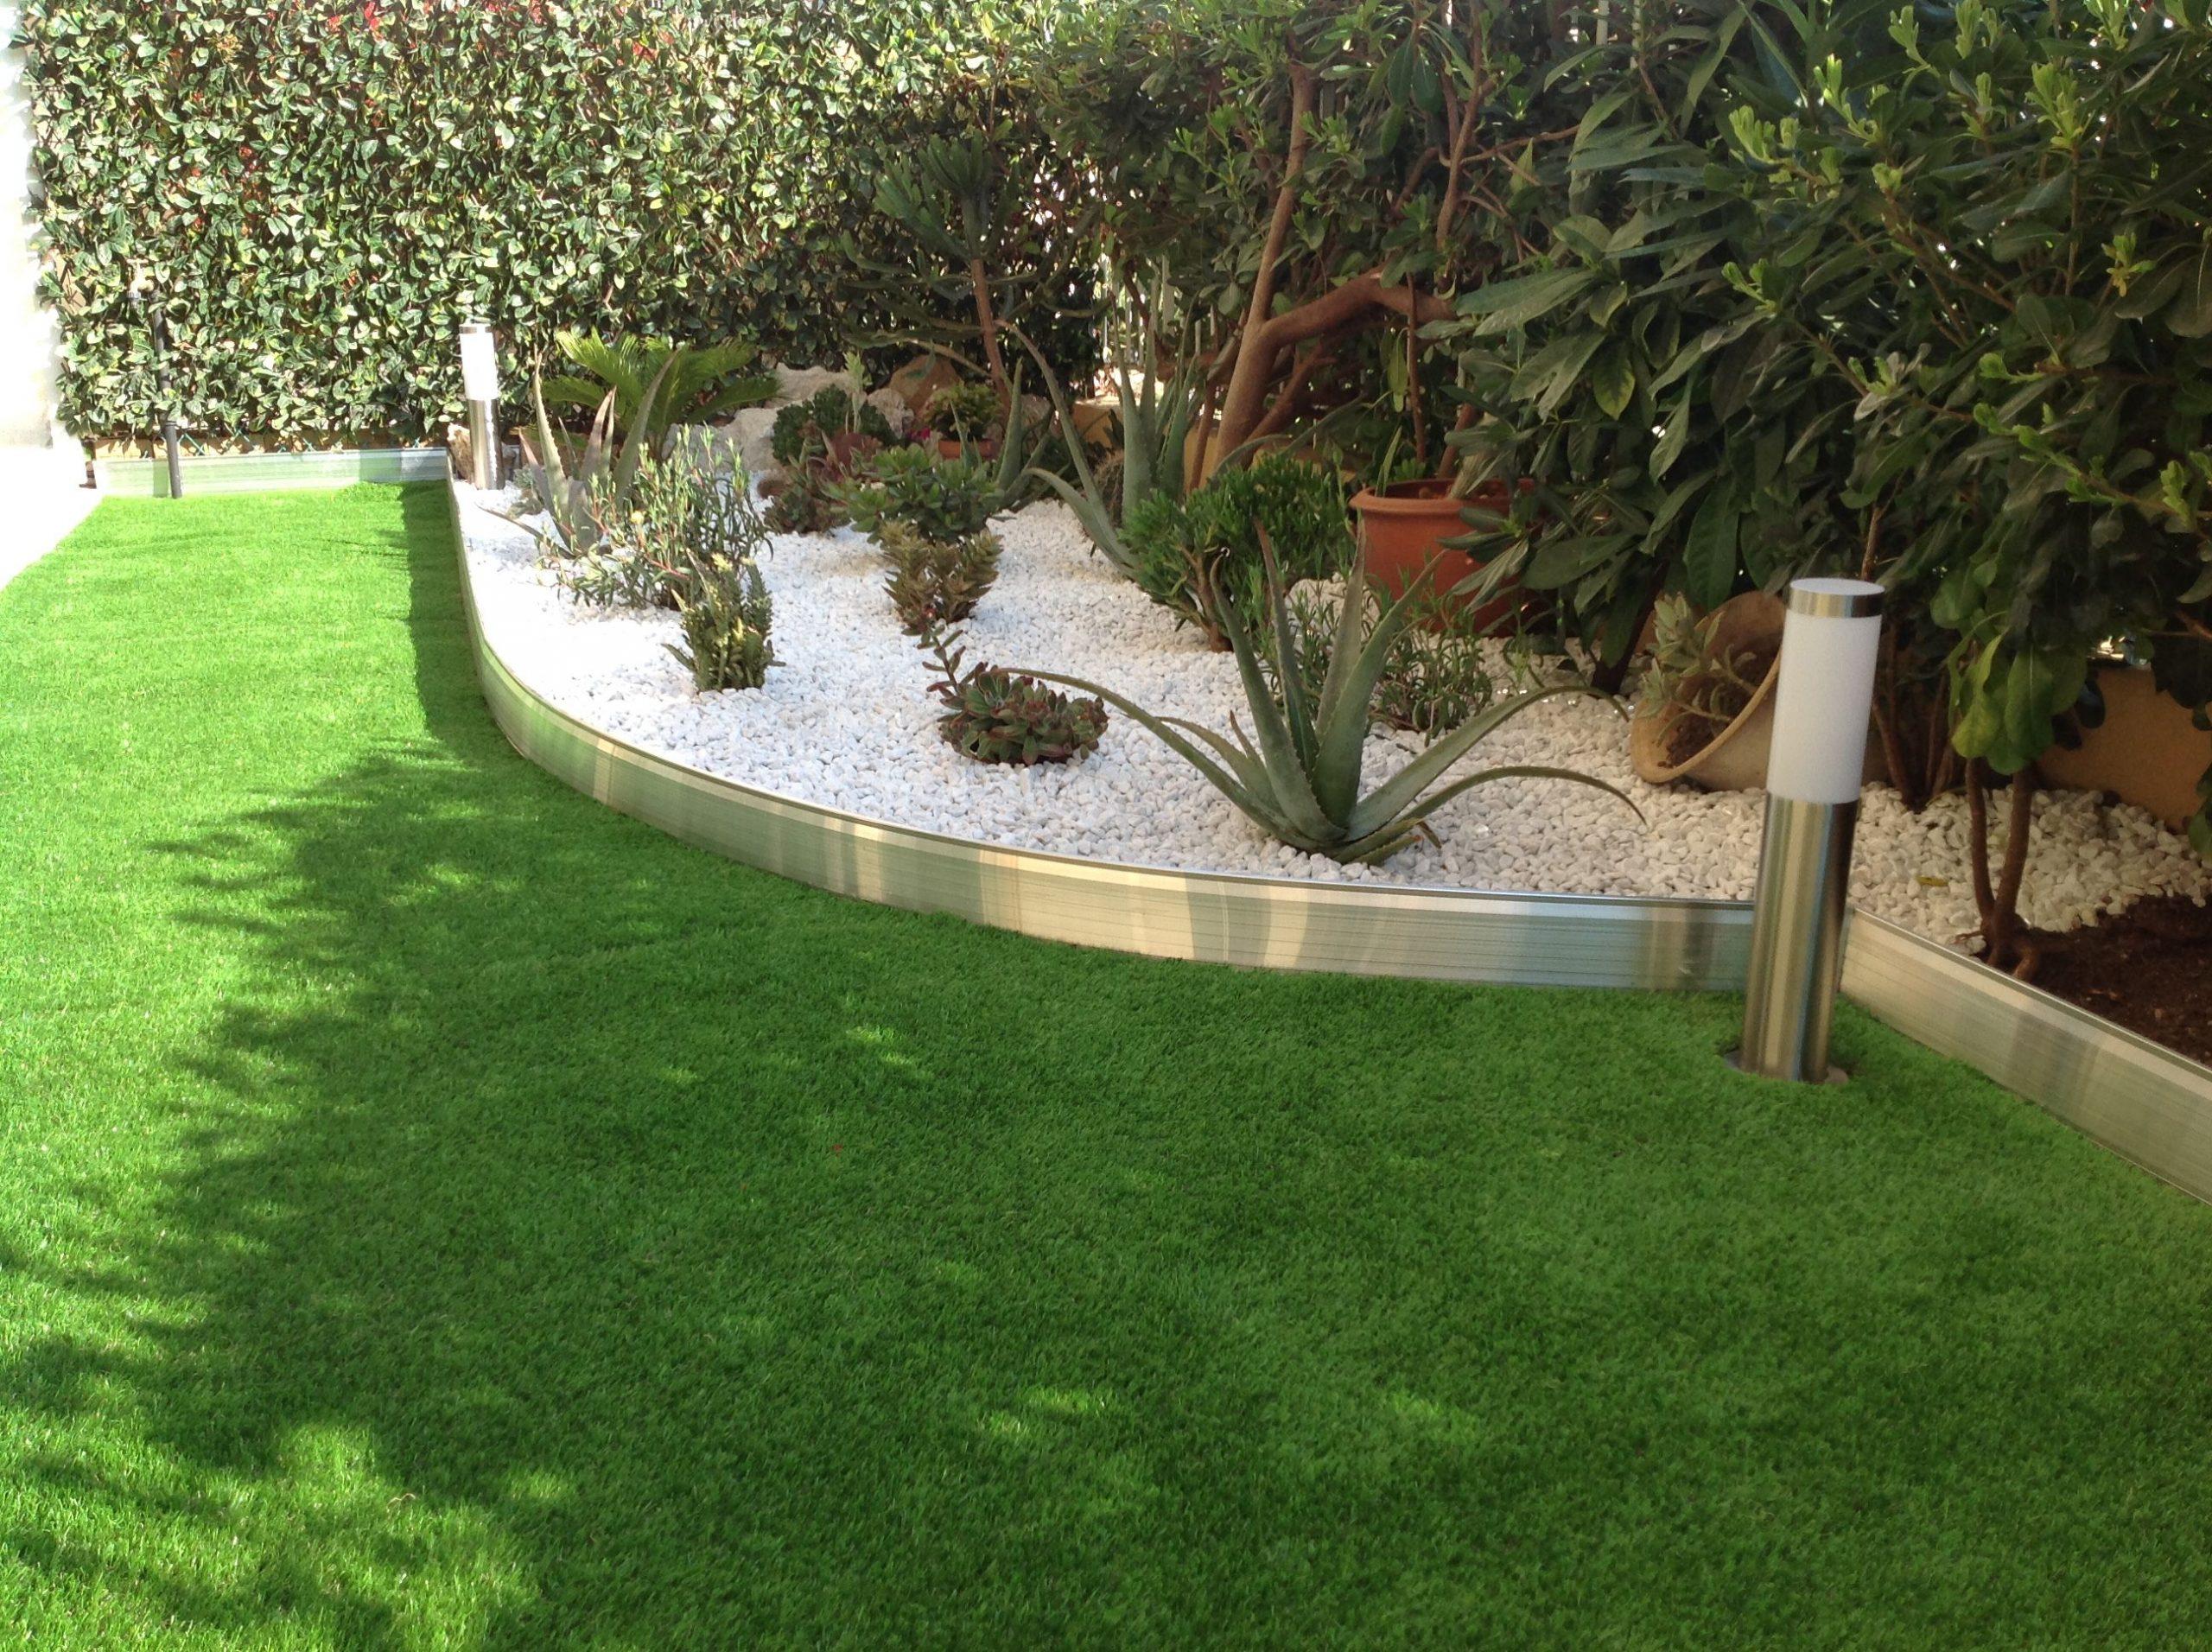 Bordure De Jardin En Aluminium Brut Avec Éclairage Led ... concernant Bordure De Jardin En Grillage